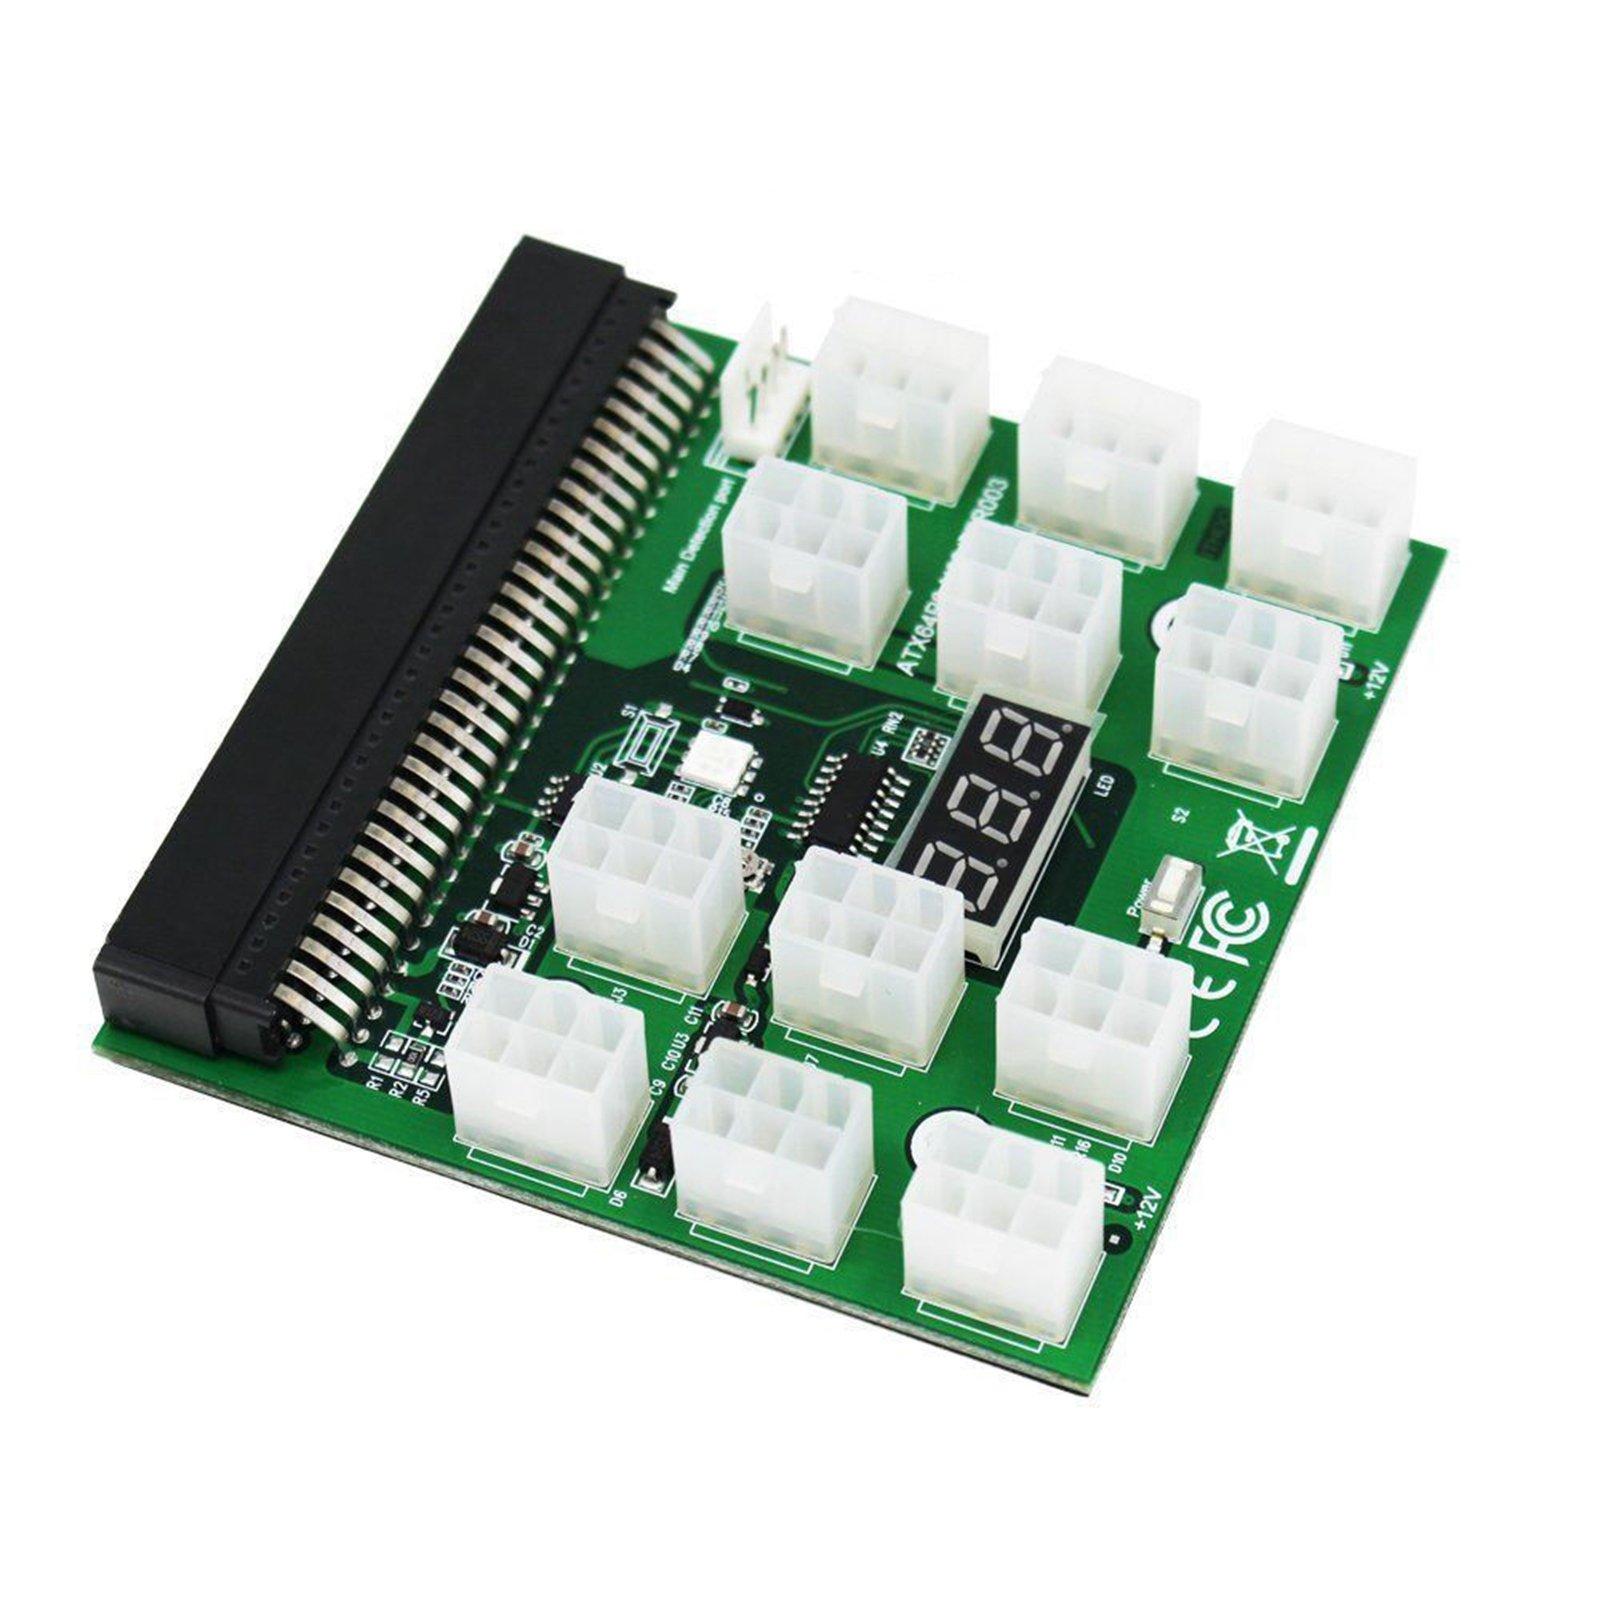 XBERSTAR 1200w/750w Breakout Board for HP PSU GPU Mining Ethereum ZEC ZCASH ETH with Button by XBERSTAR